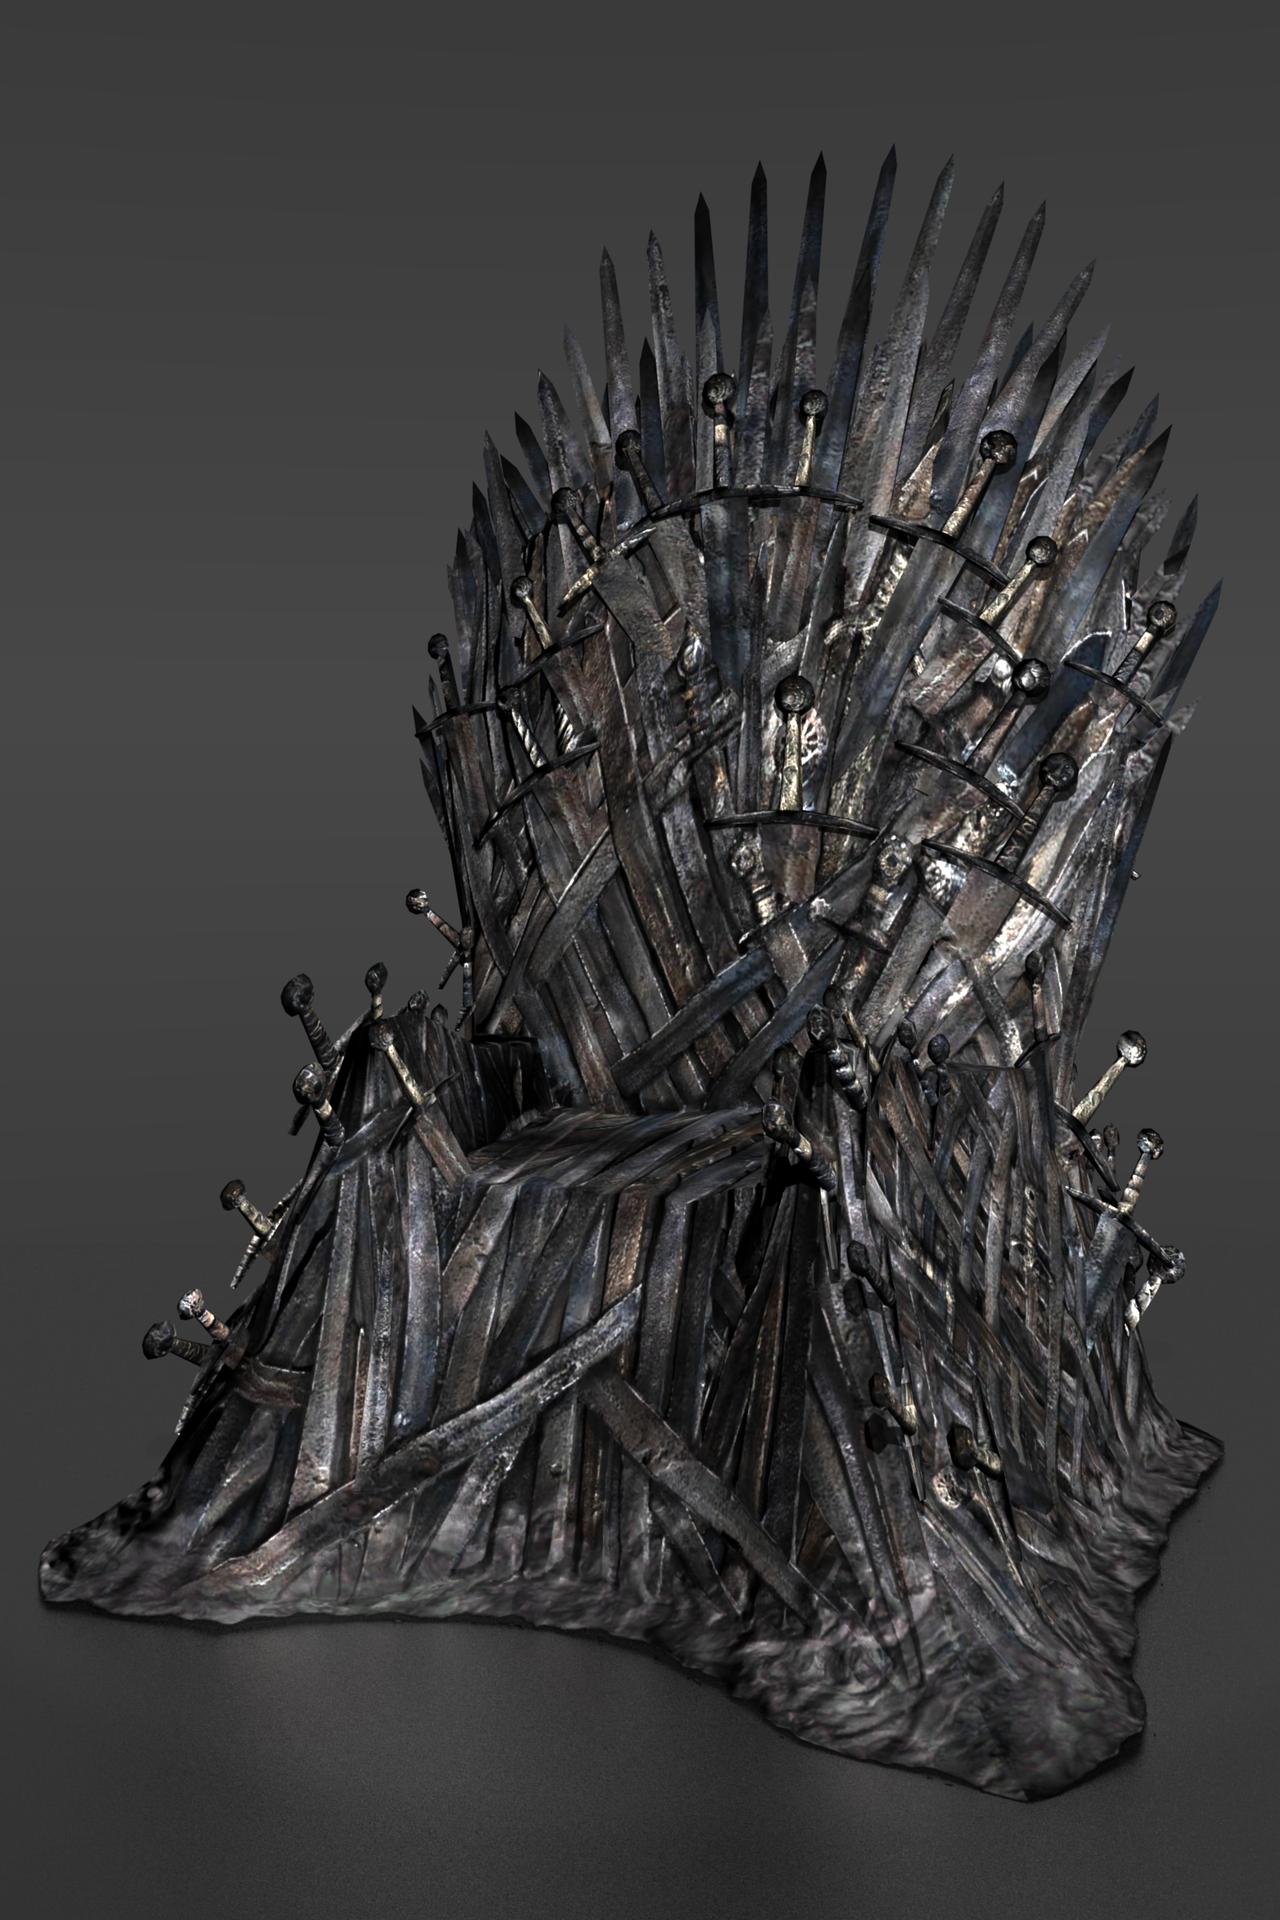 Game of thrones iron throne by ishikahiruma on deviantart for Iron throne painting